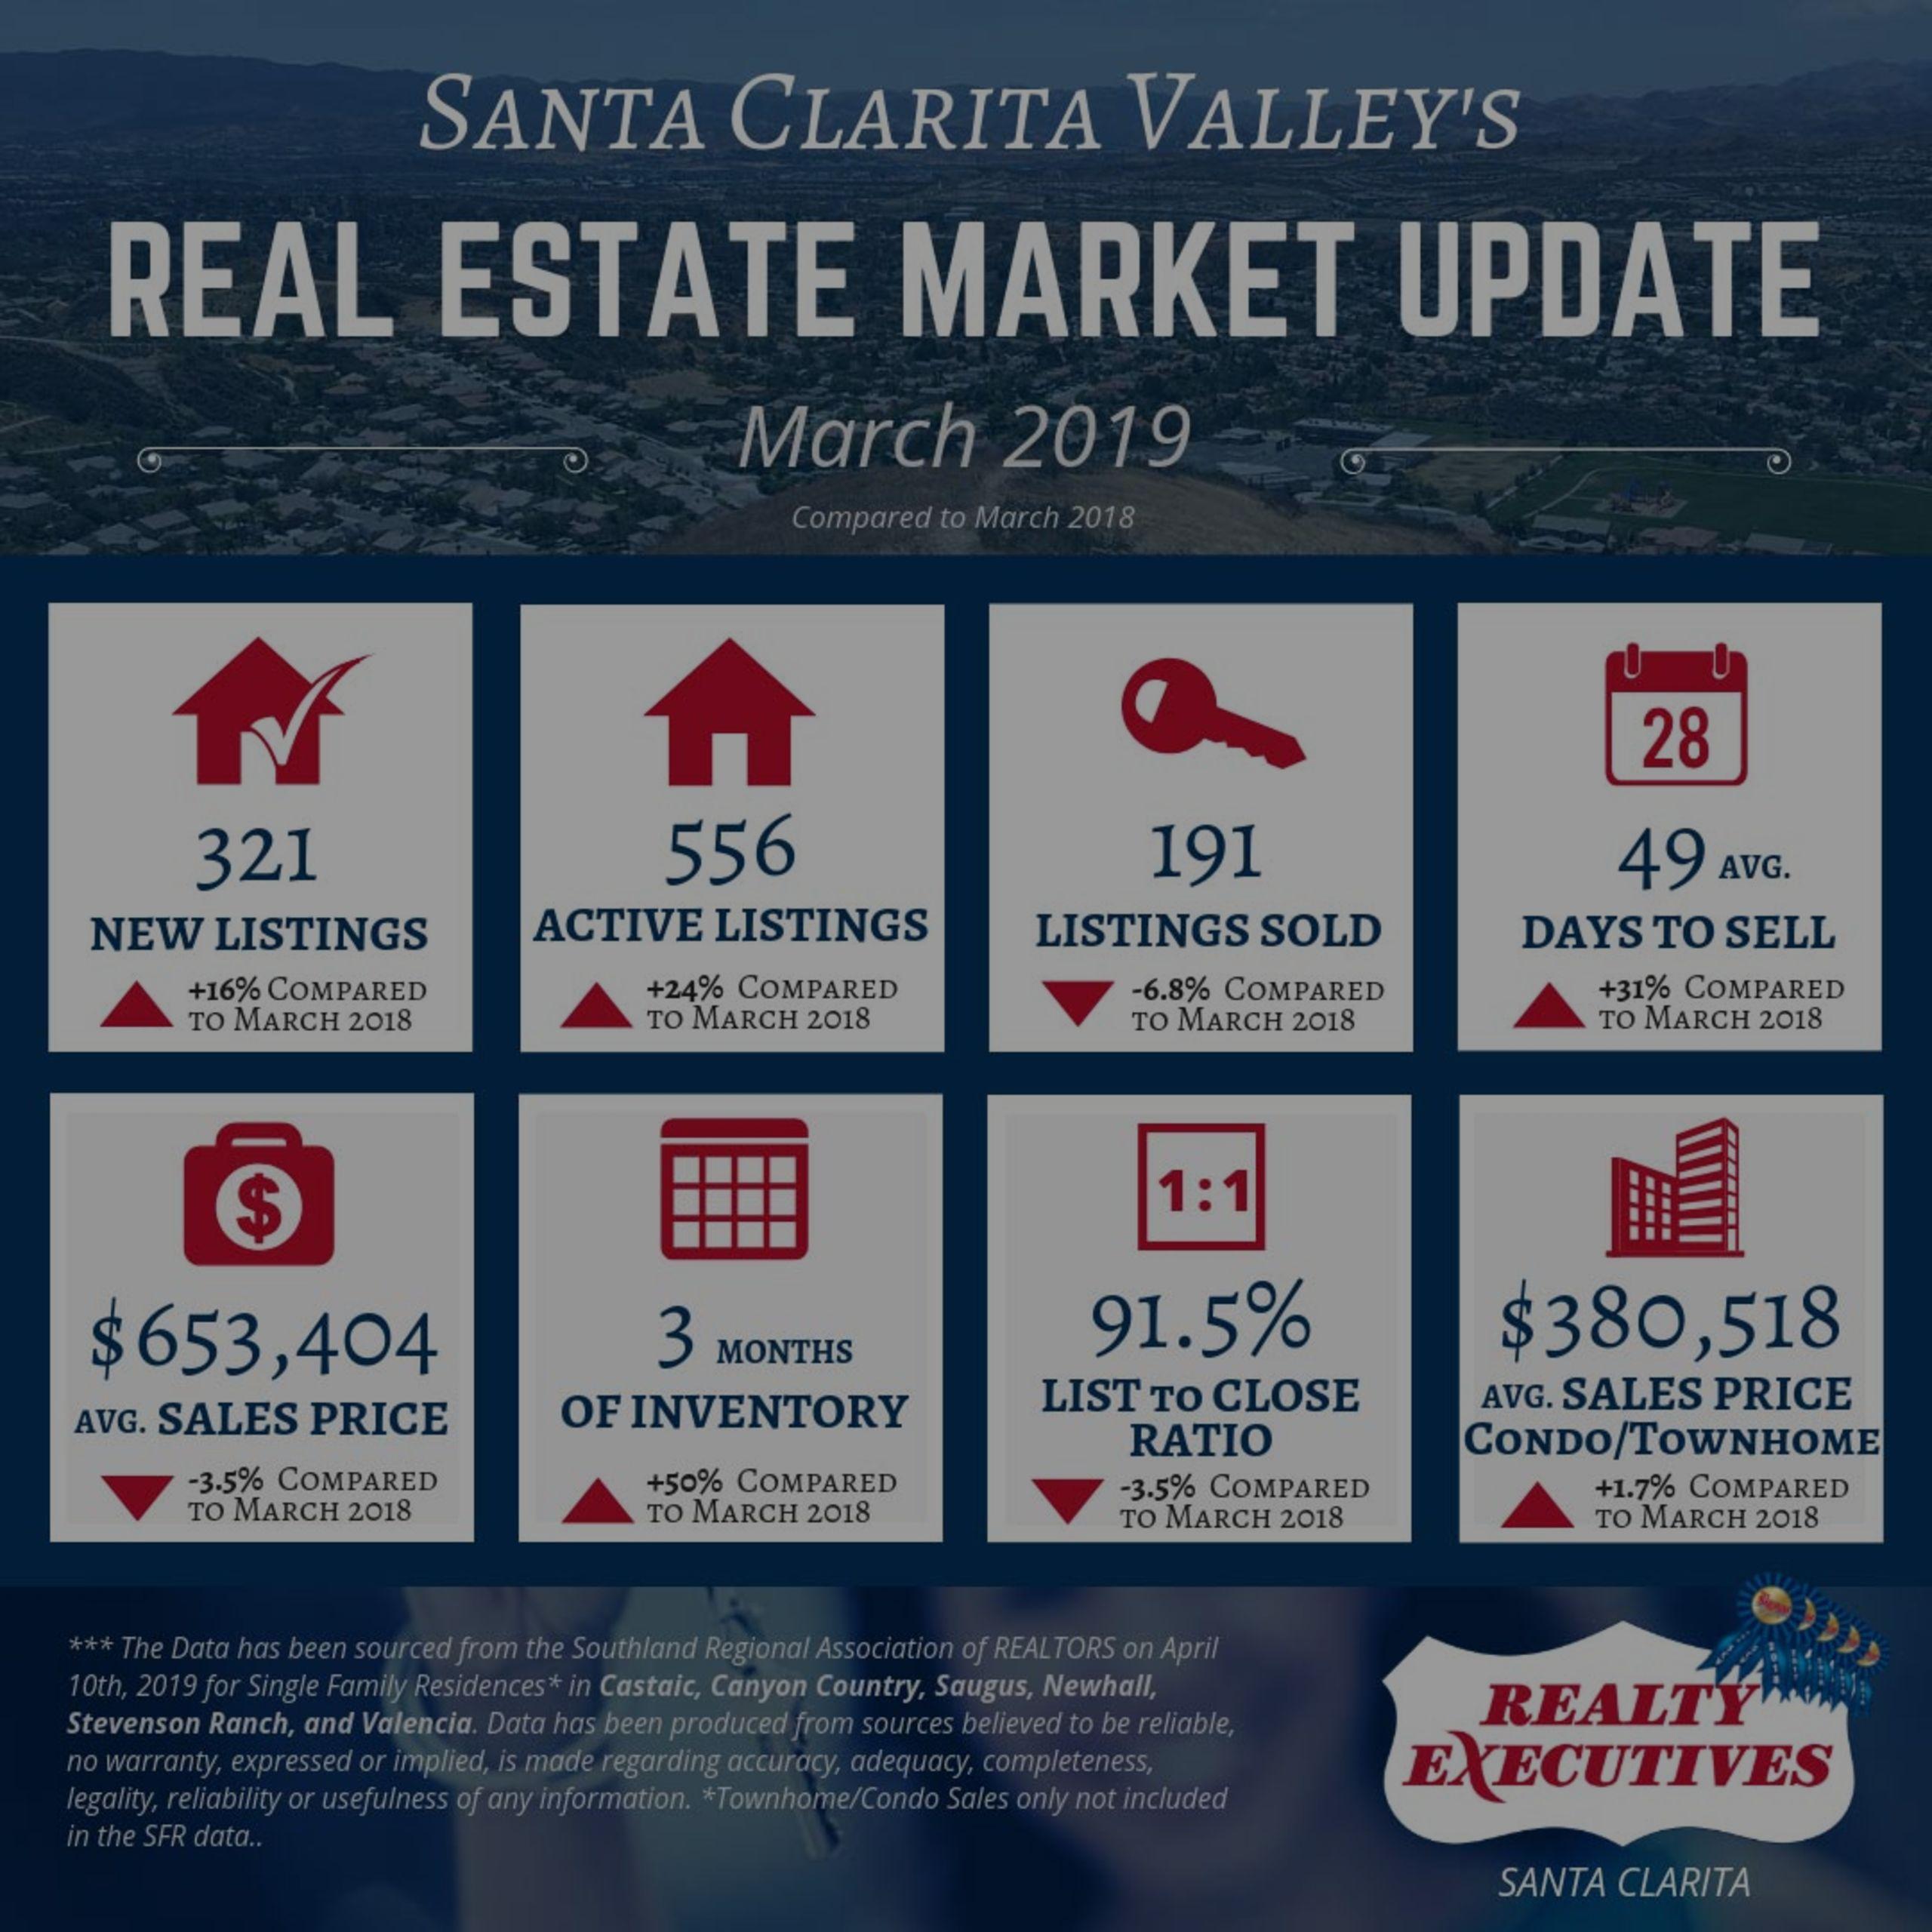 March 2019: Santa Clarita Valley Real Estate Market Update